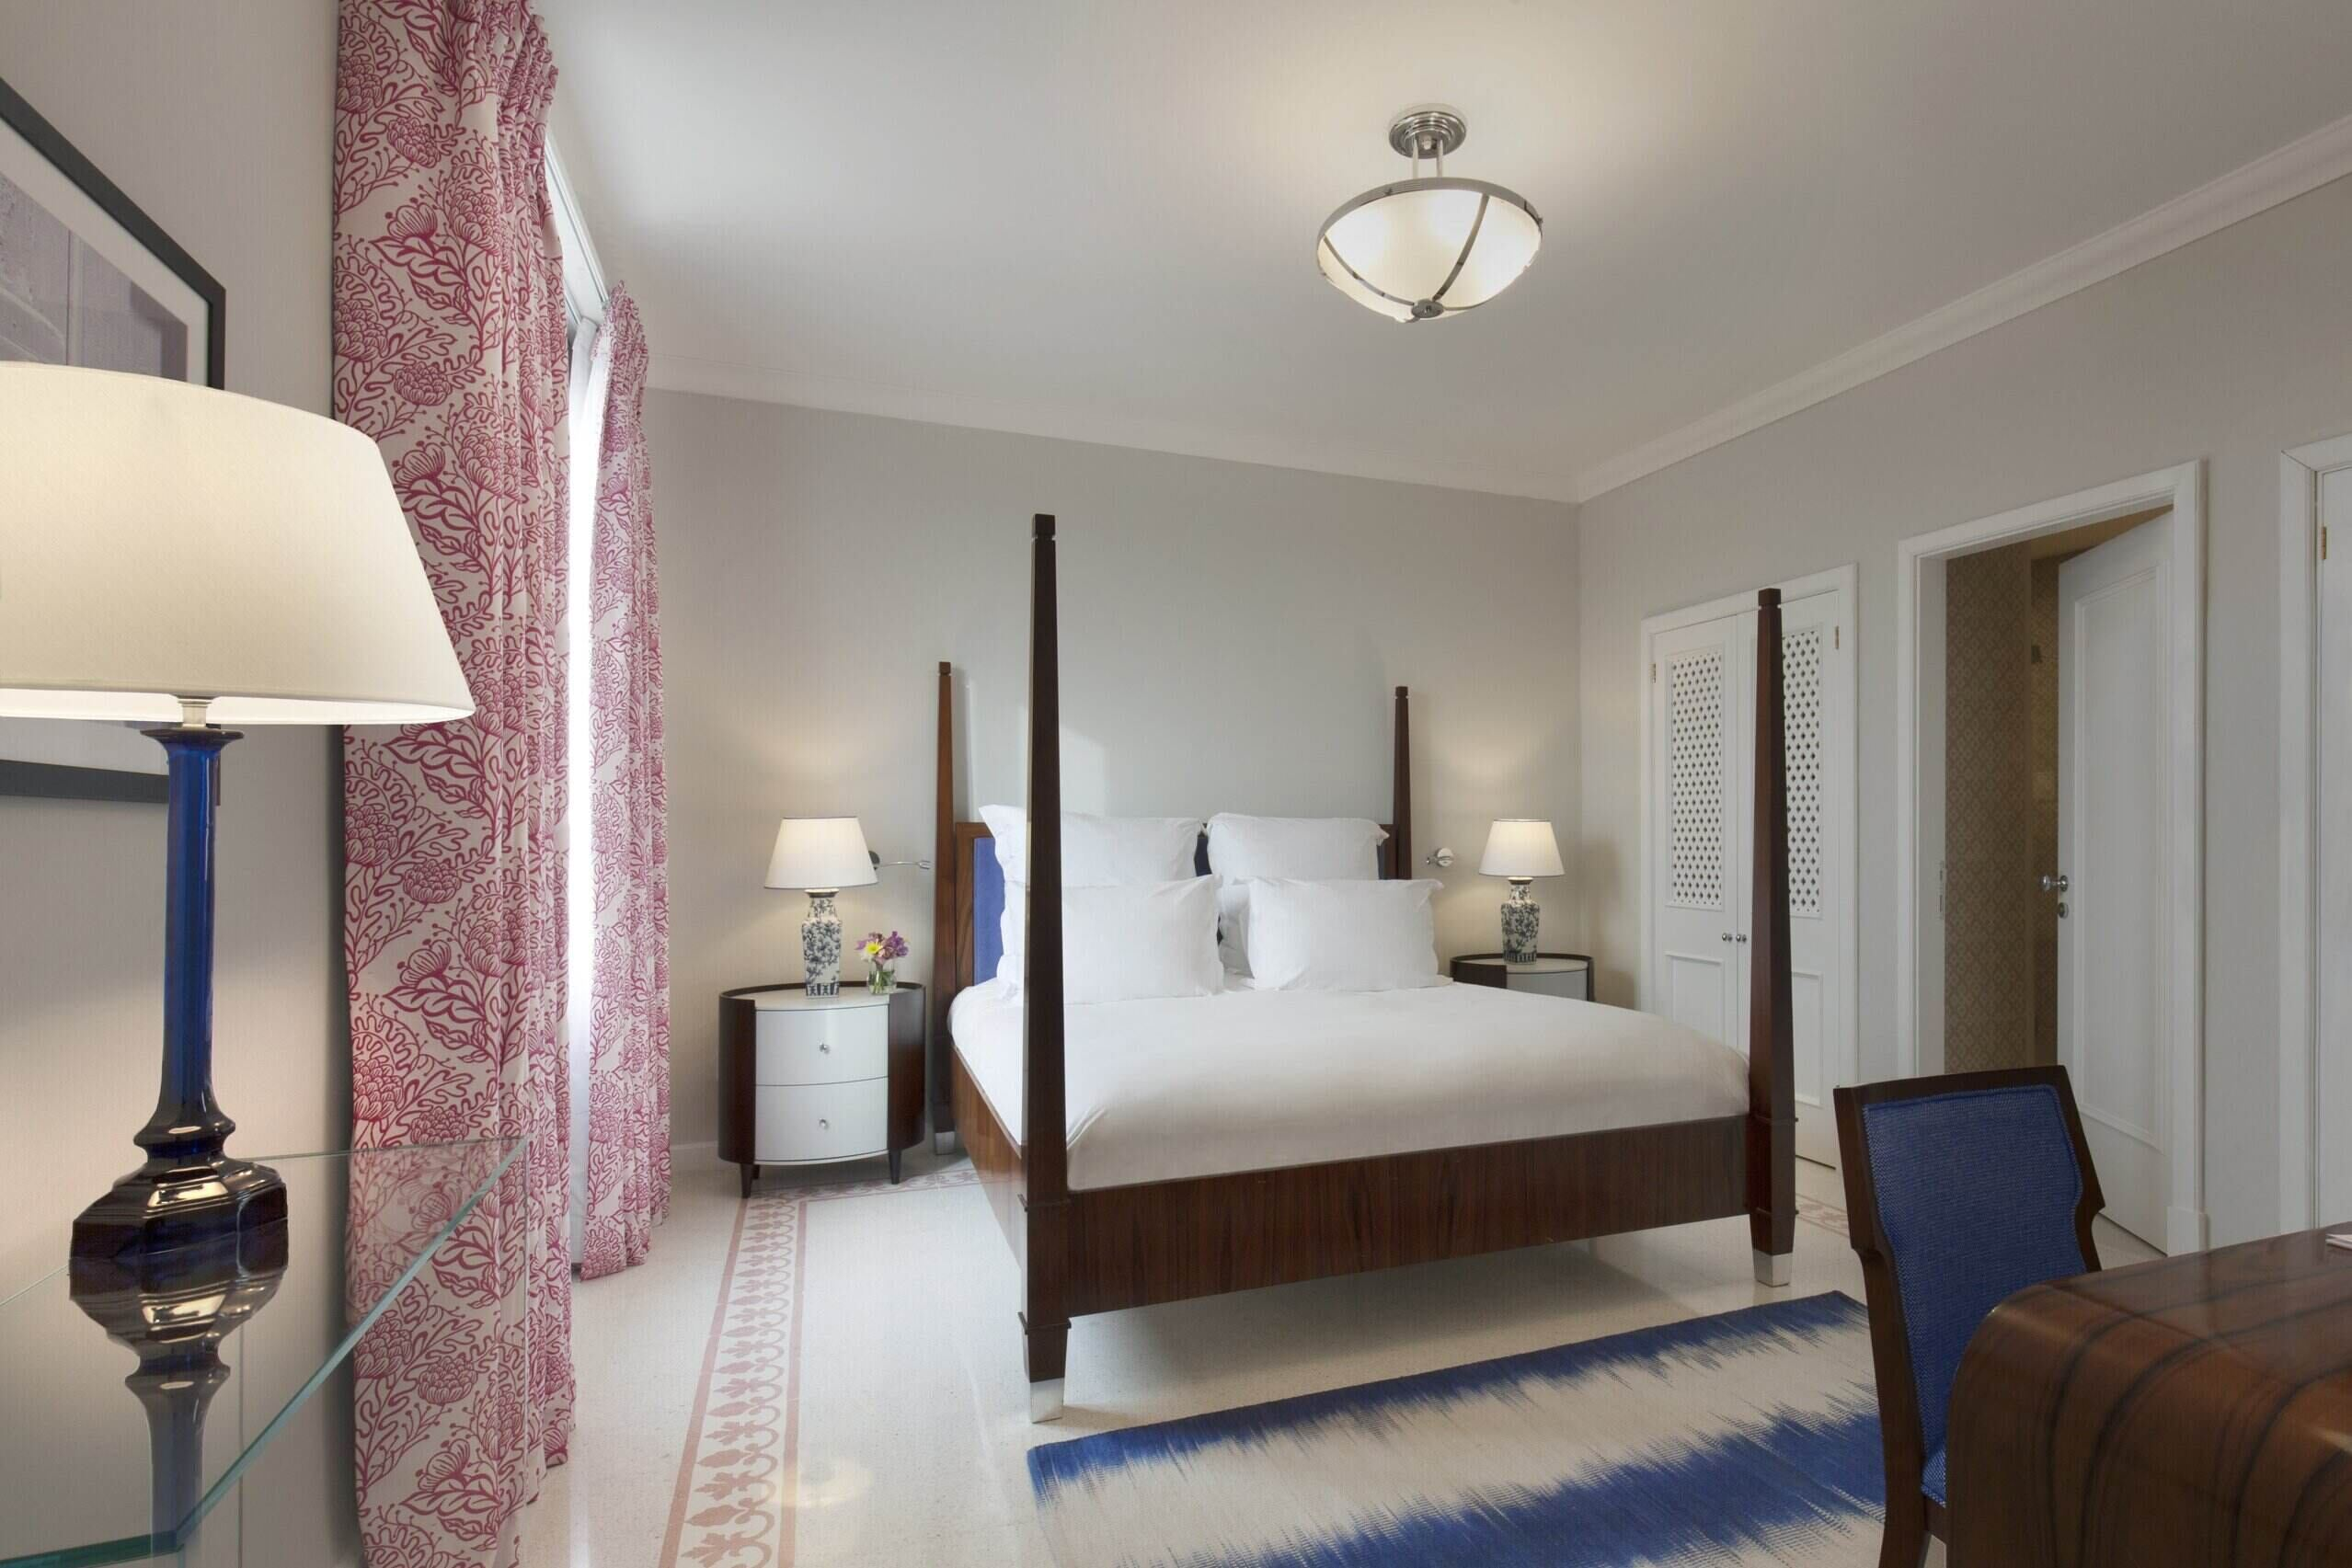 Phoenicia, hotel, malta, accommodation, lgbt, gay, friendly